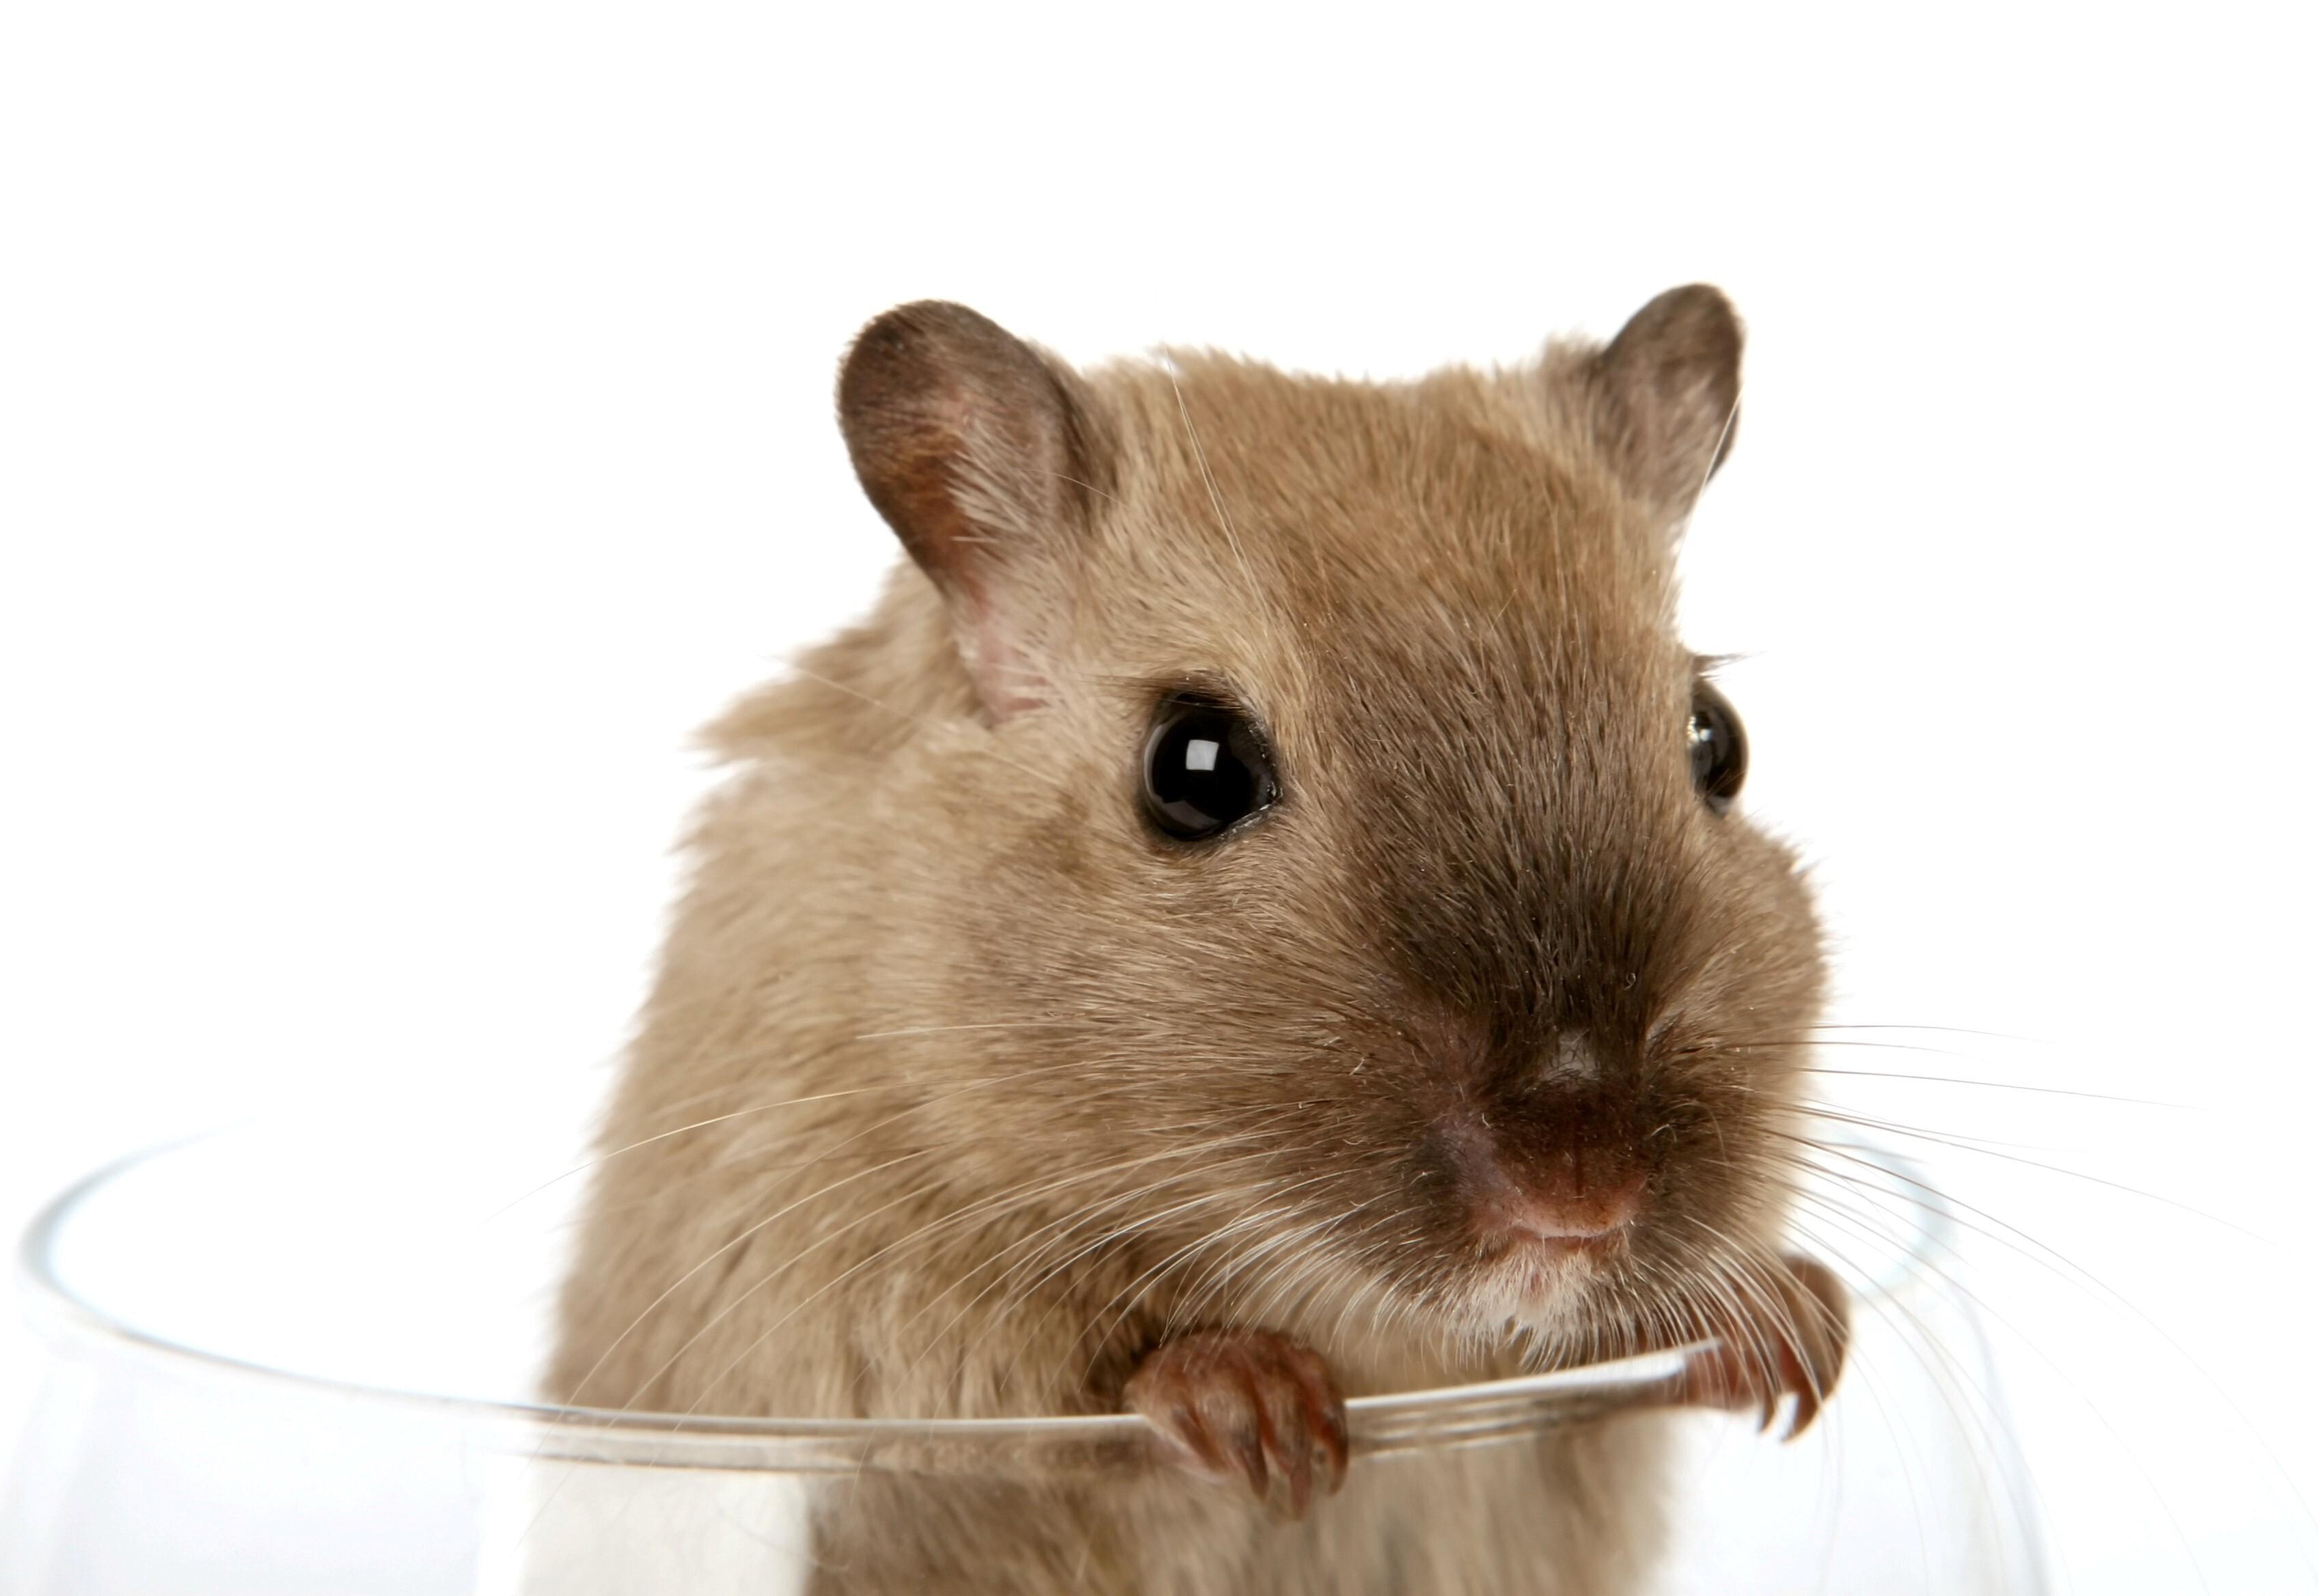 Funny Rat In Glass Wallpaper Hd Wallpapers